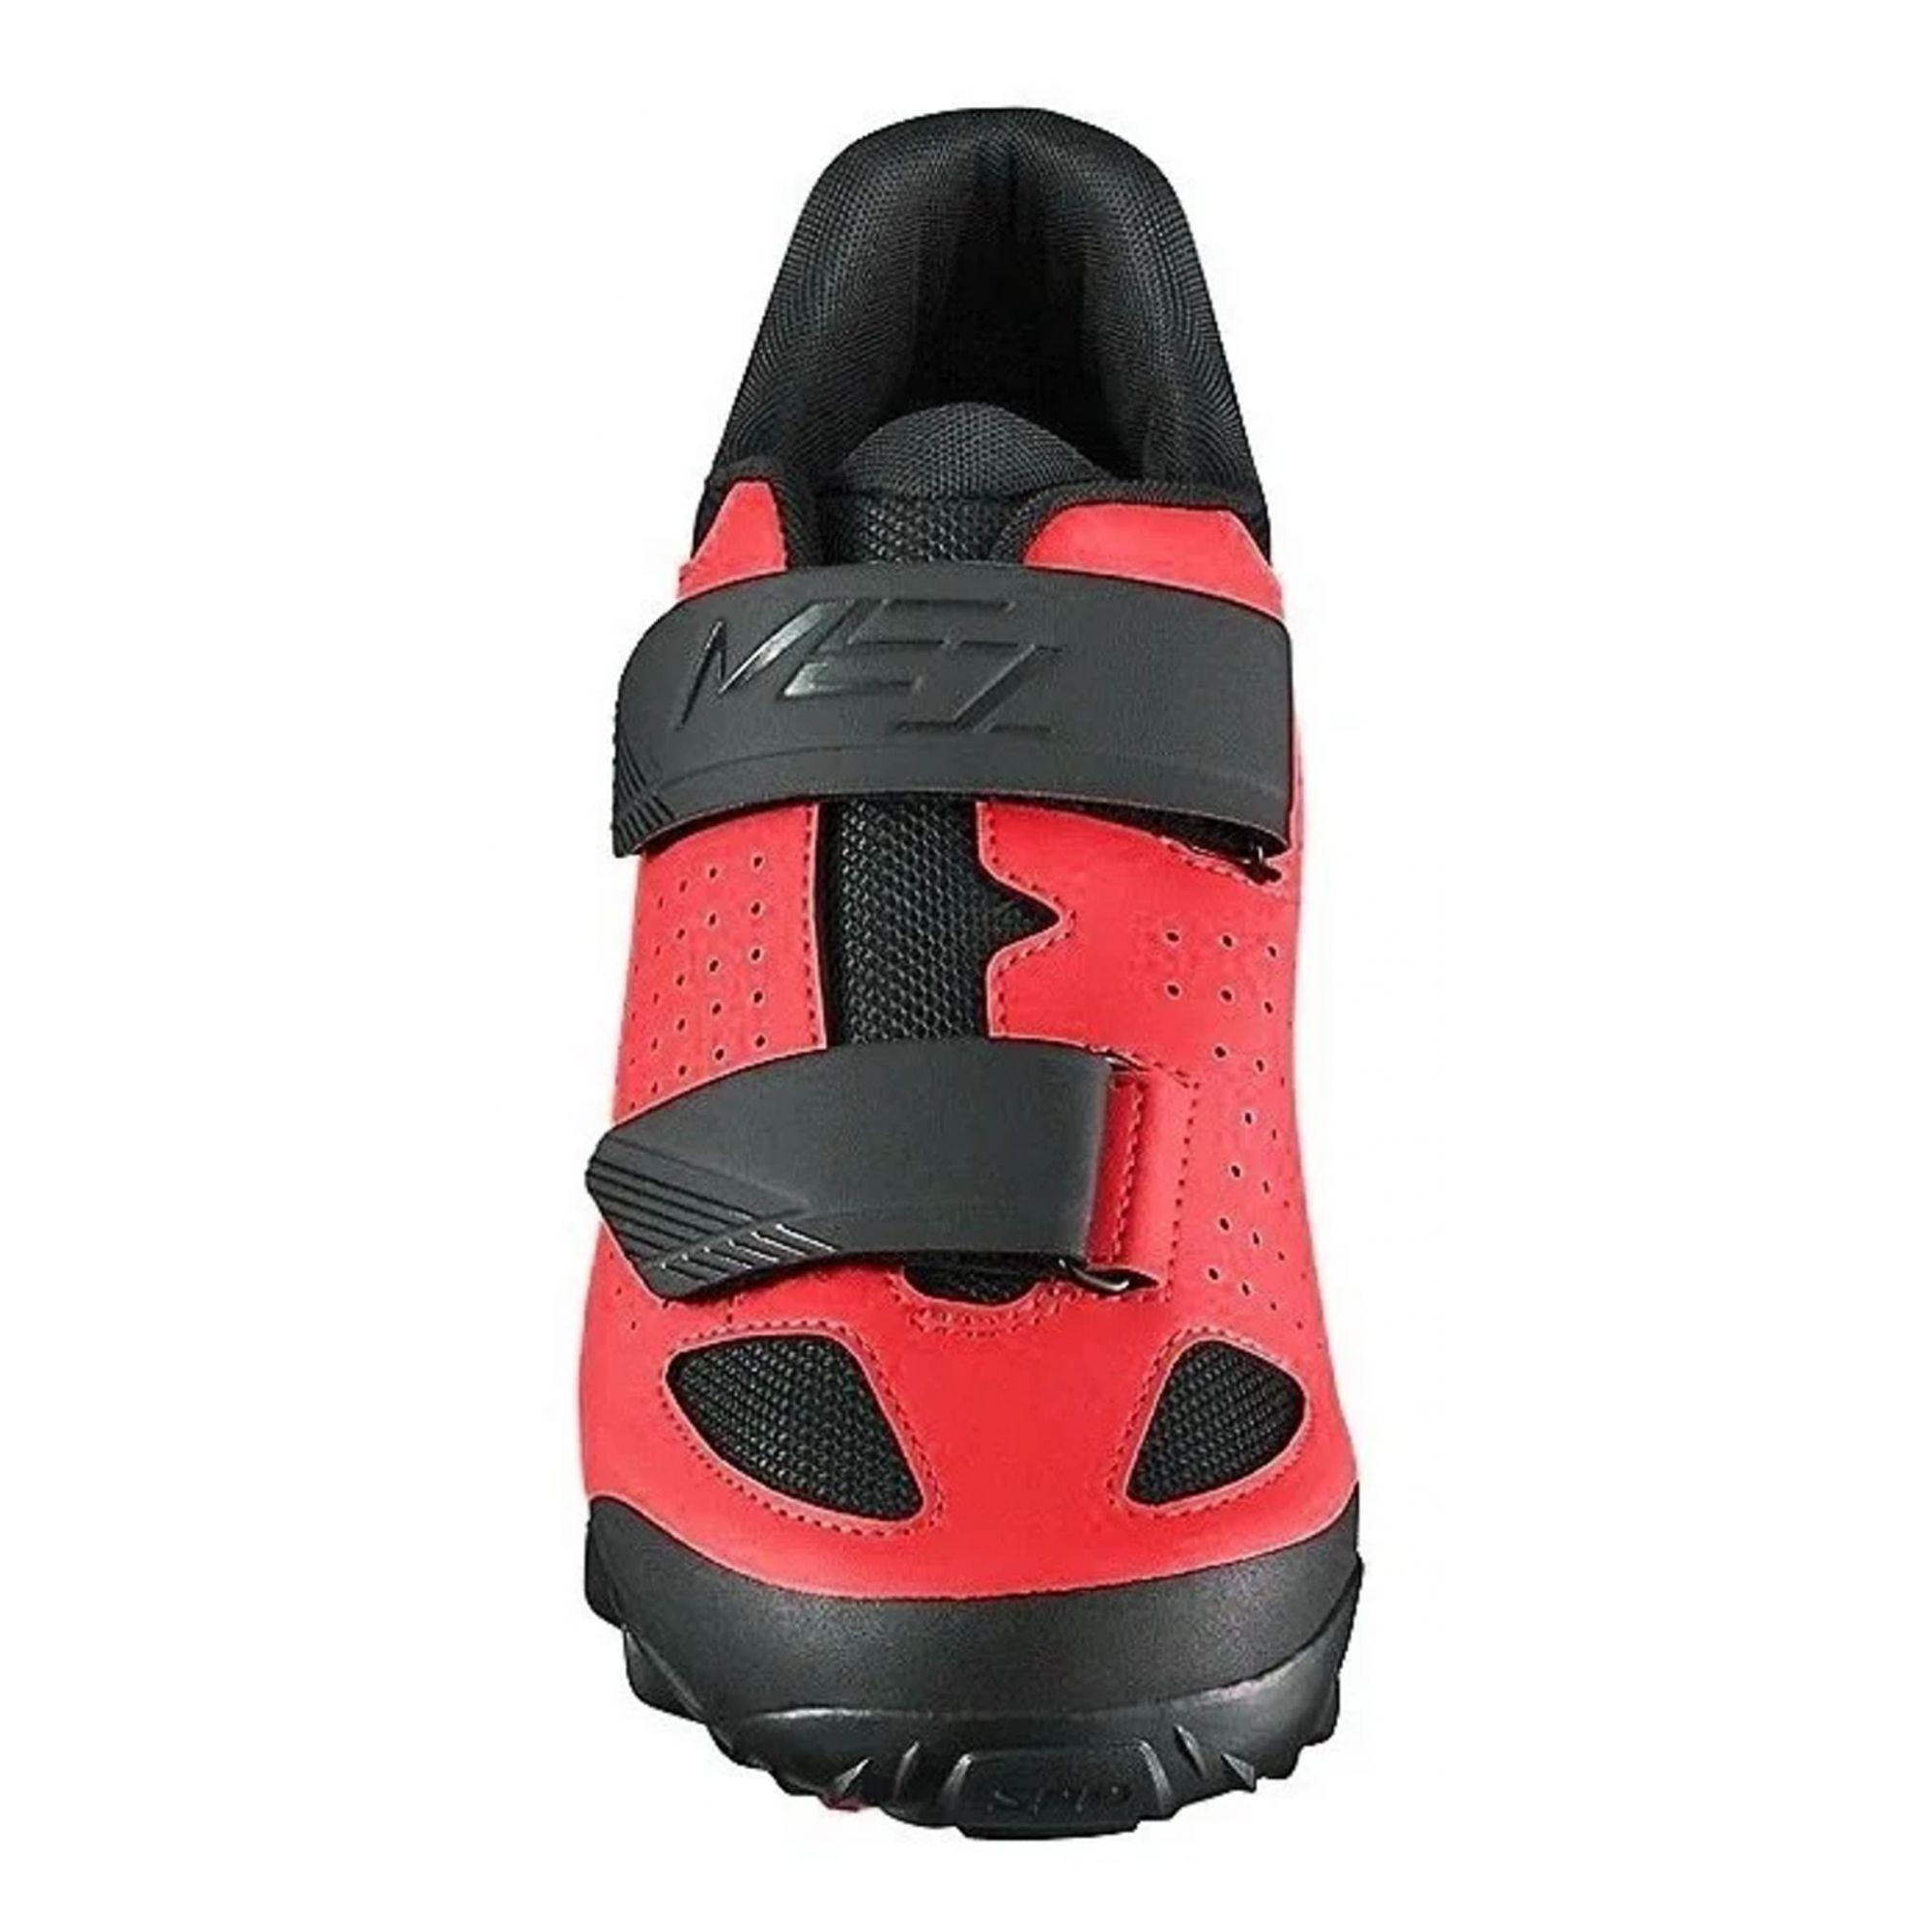 Sapatilha Mtb Shimano Sh-me100 E Pedal Clip Wellgo